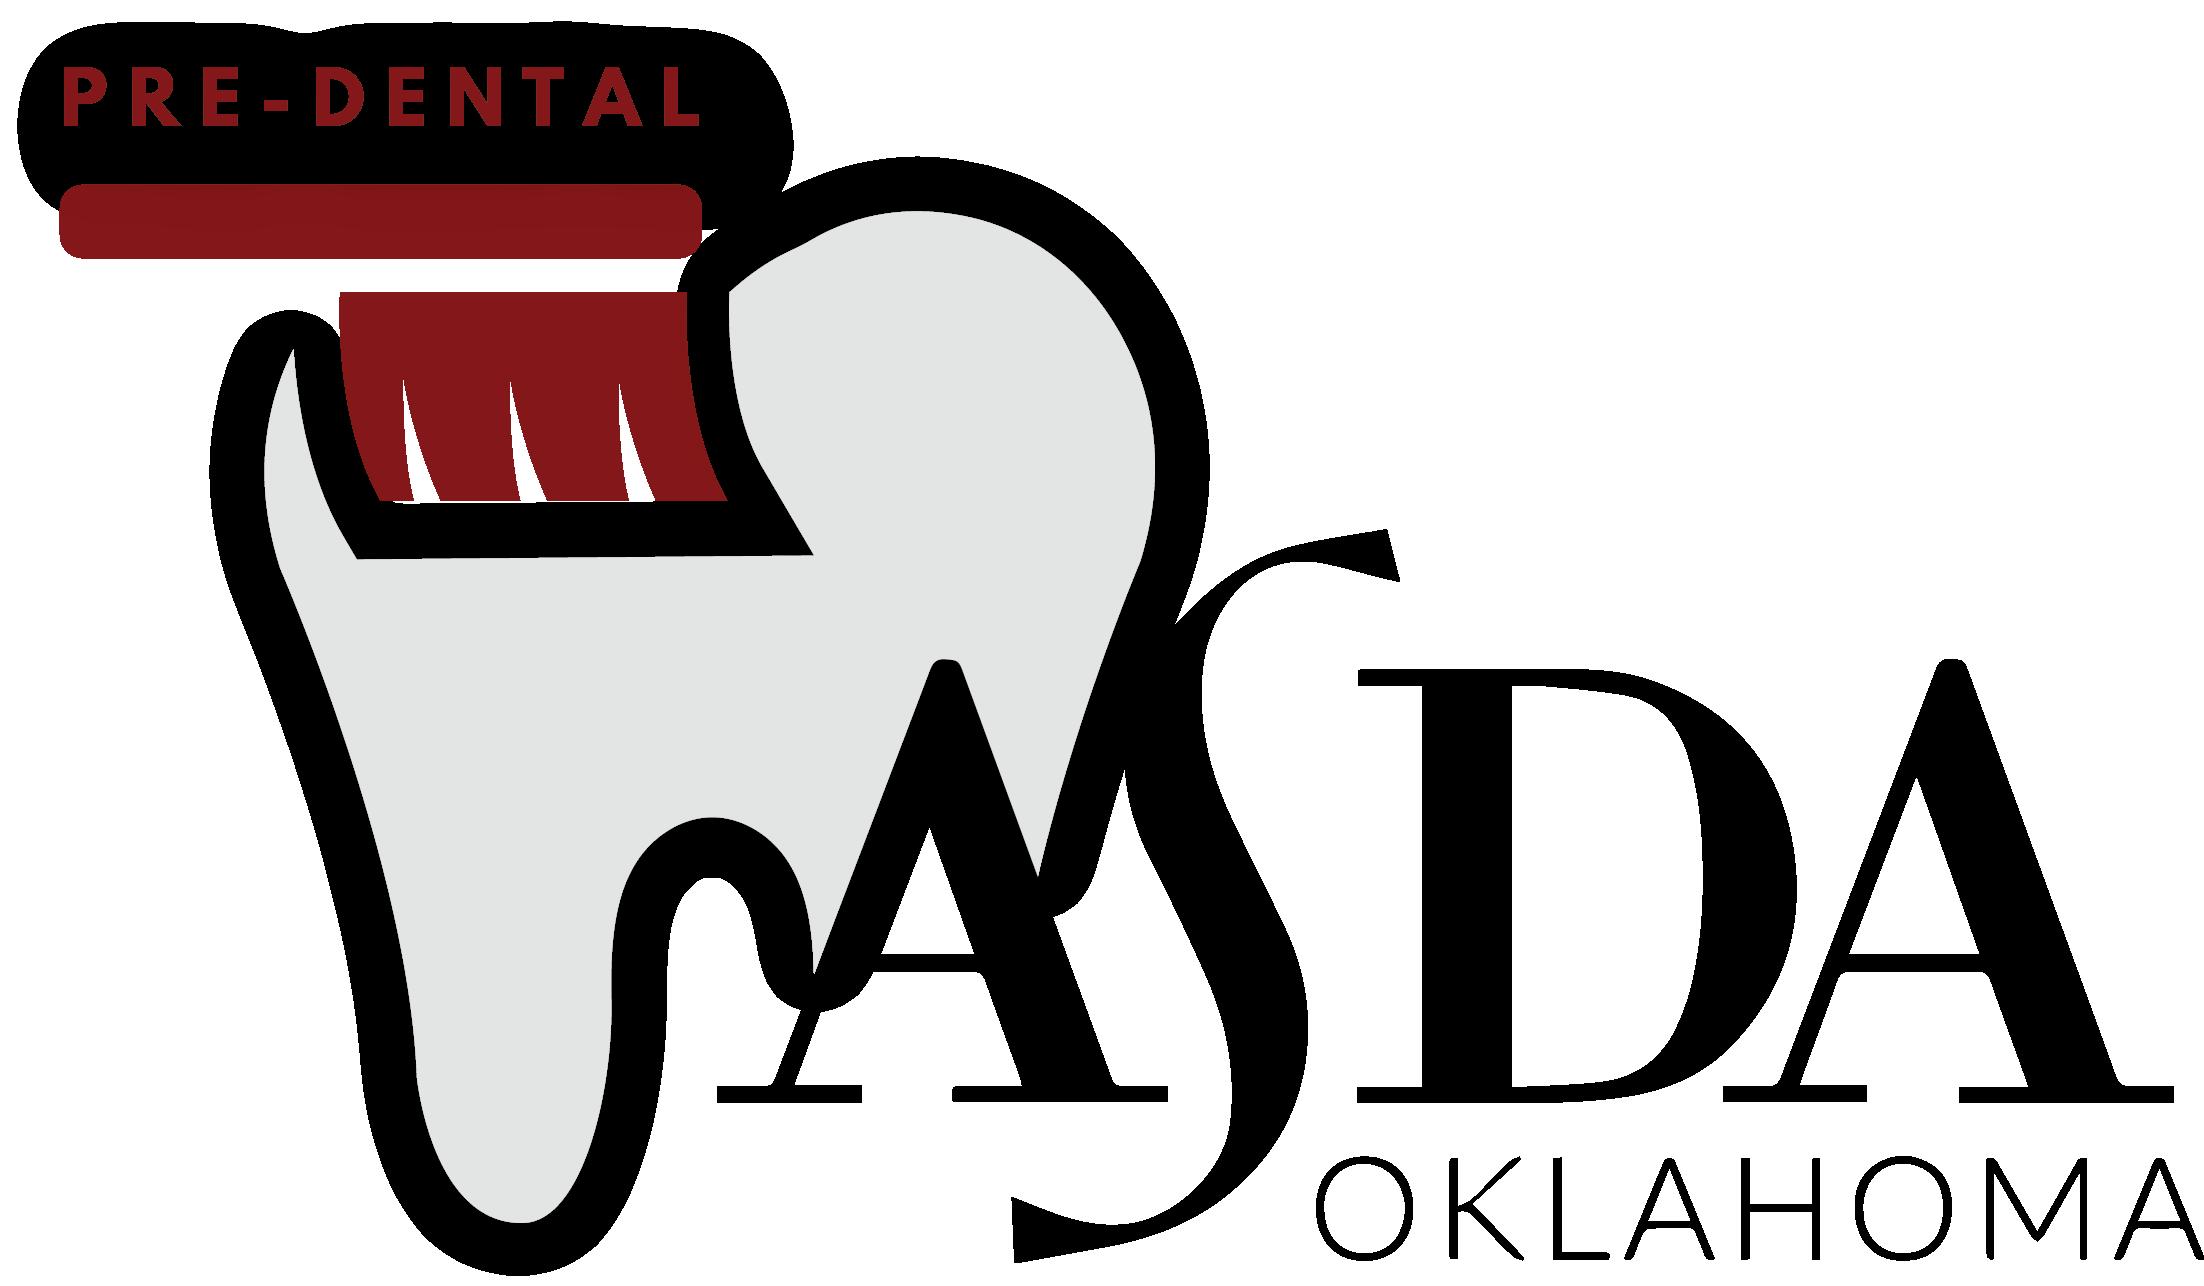 PreDent ASDA Logo.png